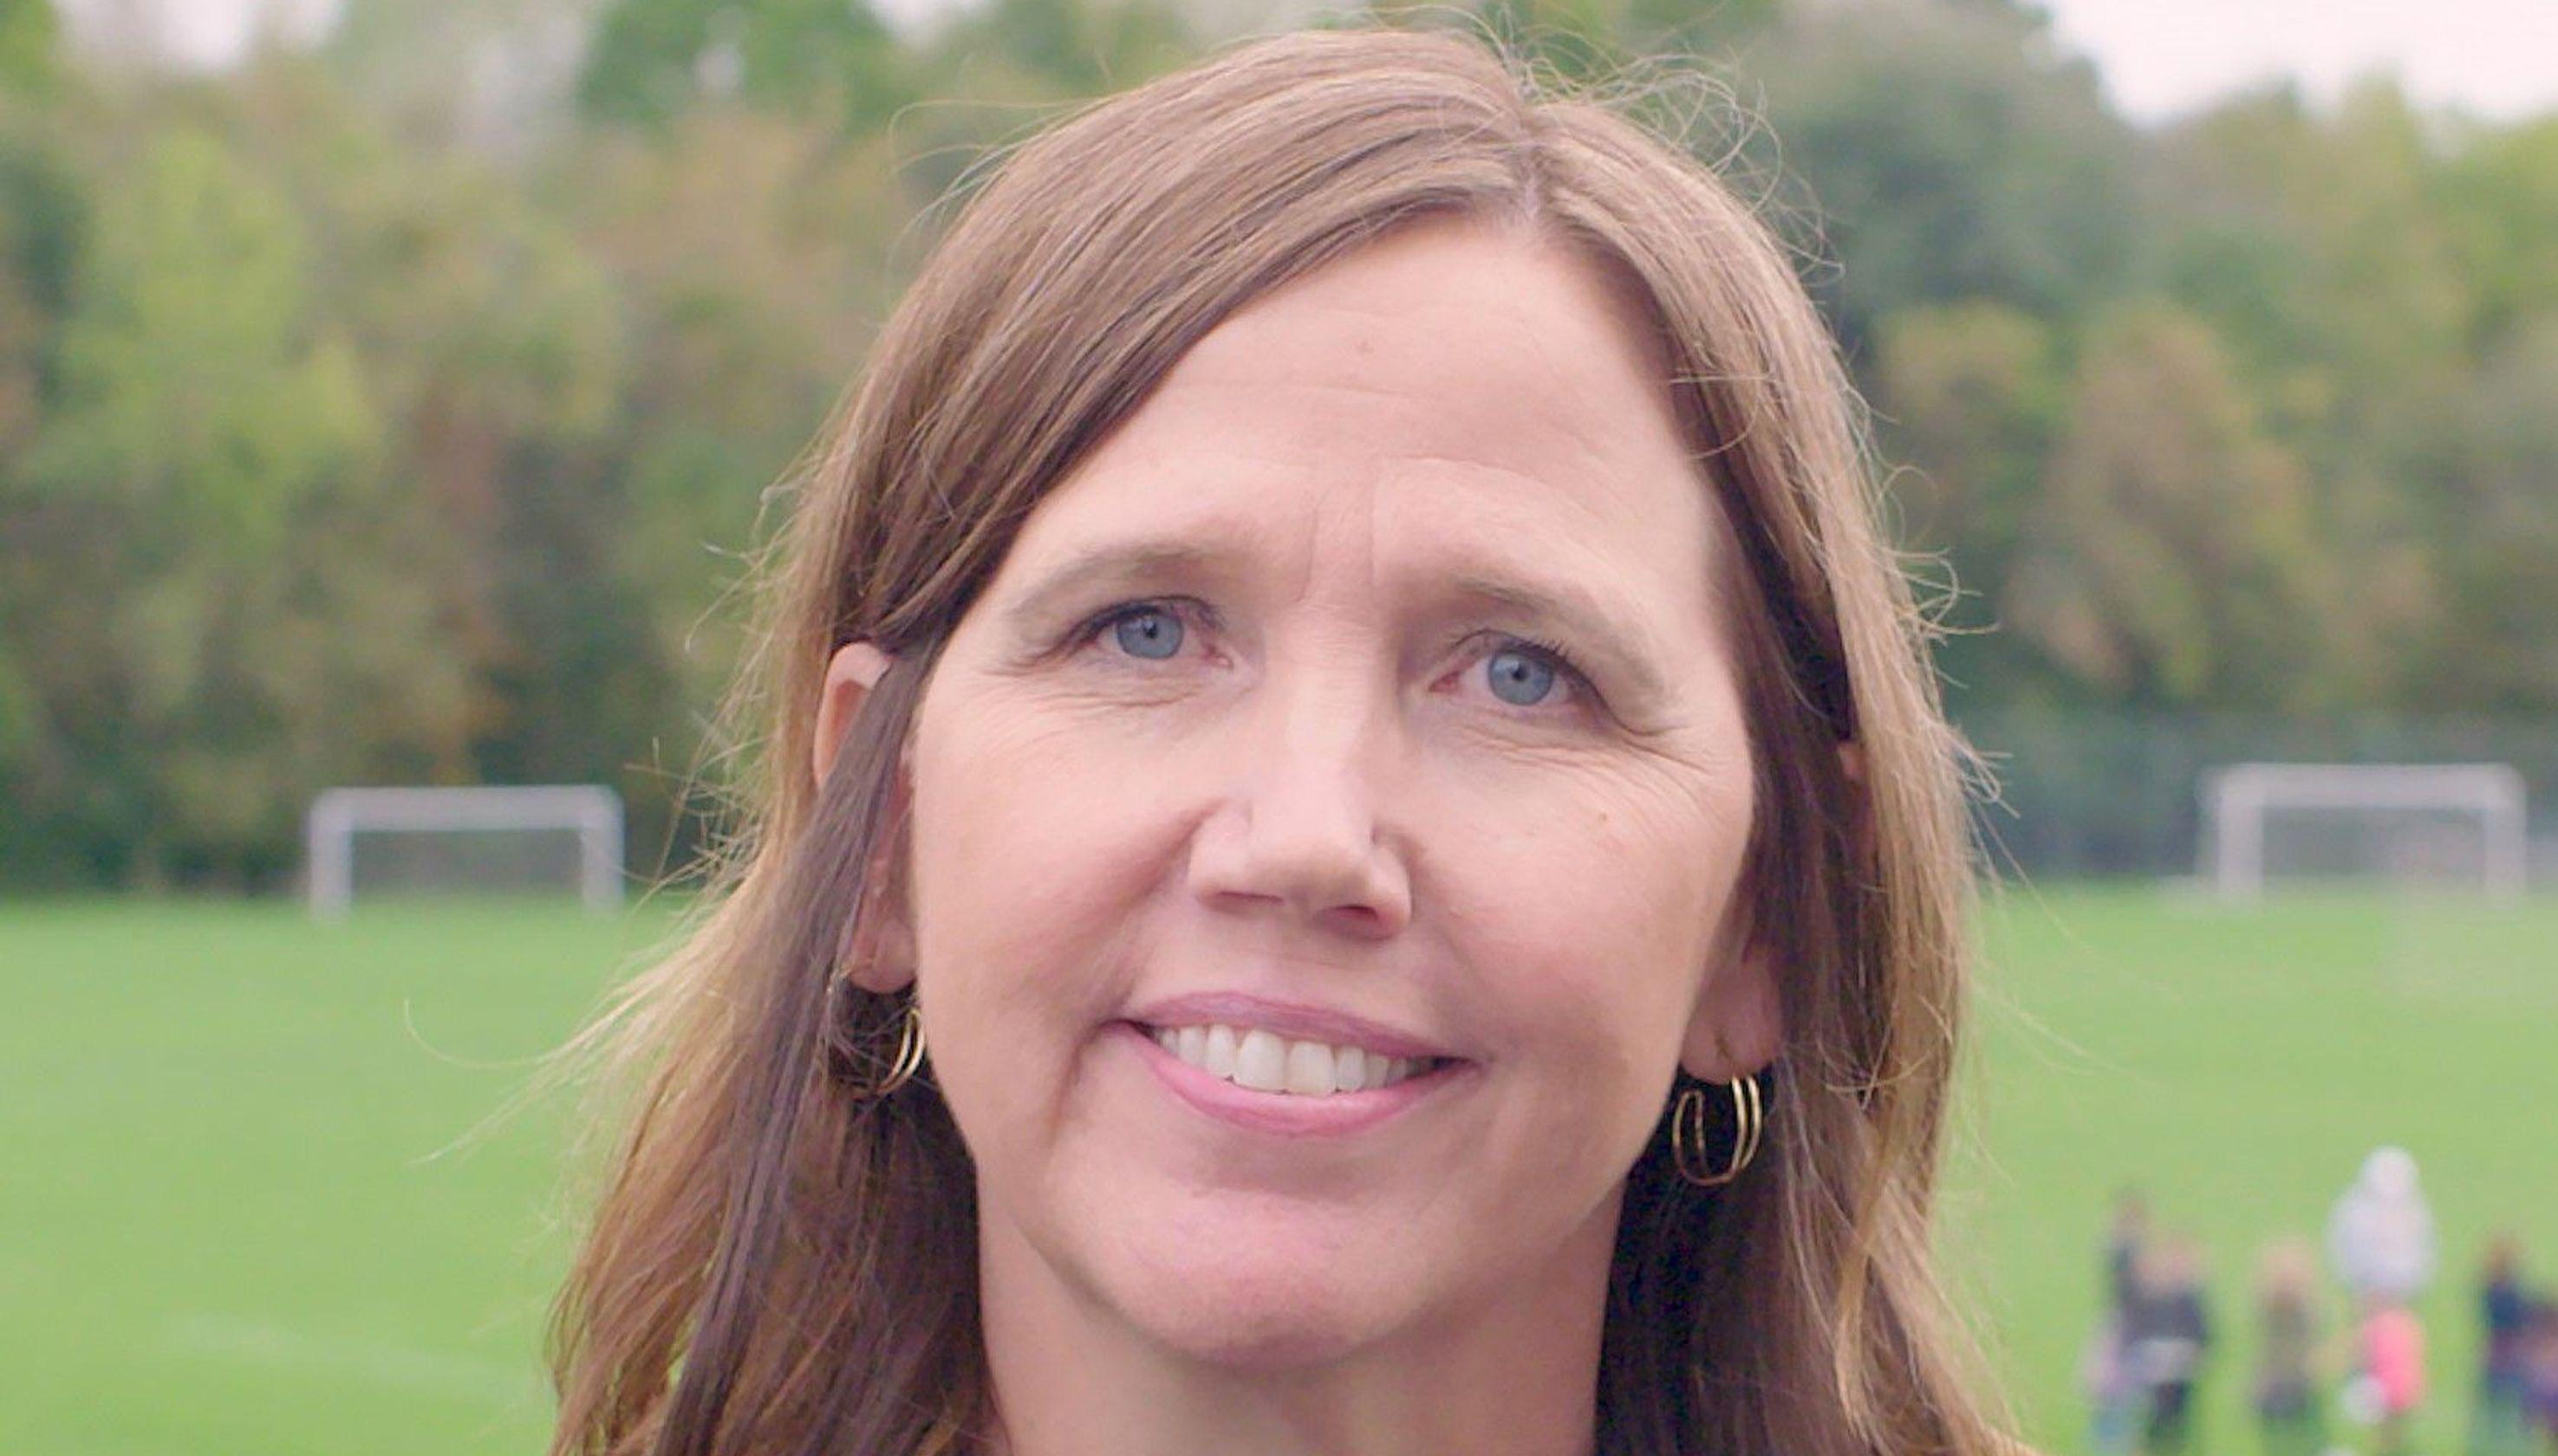 We must make Iowa education a model for U.S. again